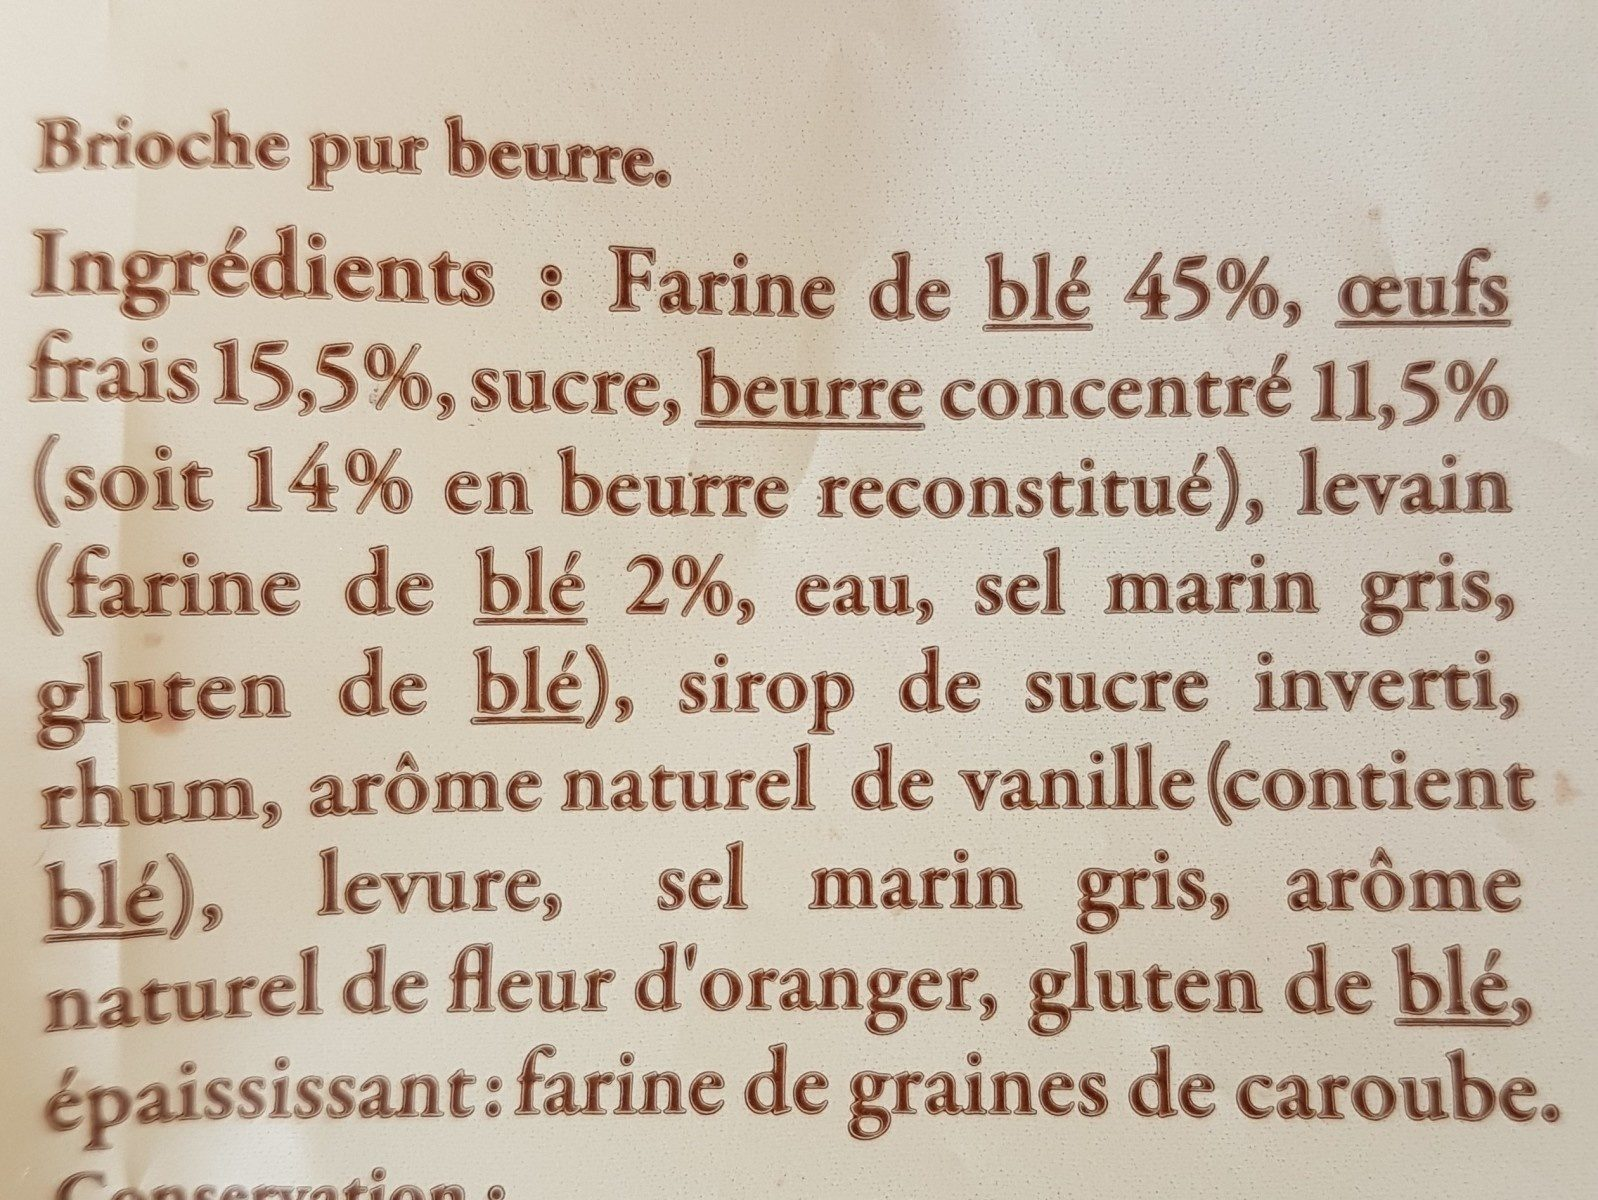 Brioche vendéenne I.G.P. - Ingrédients - fr